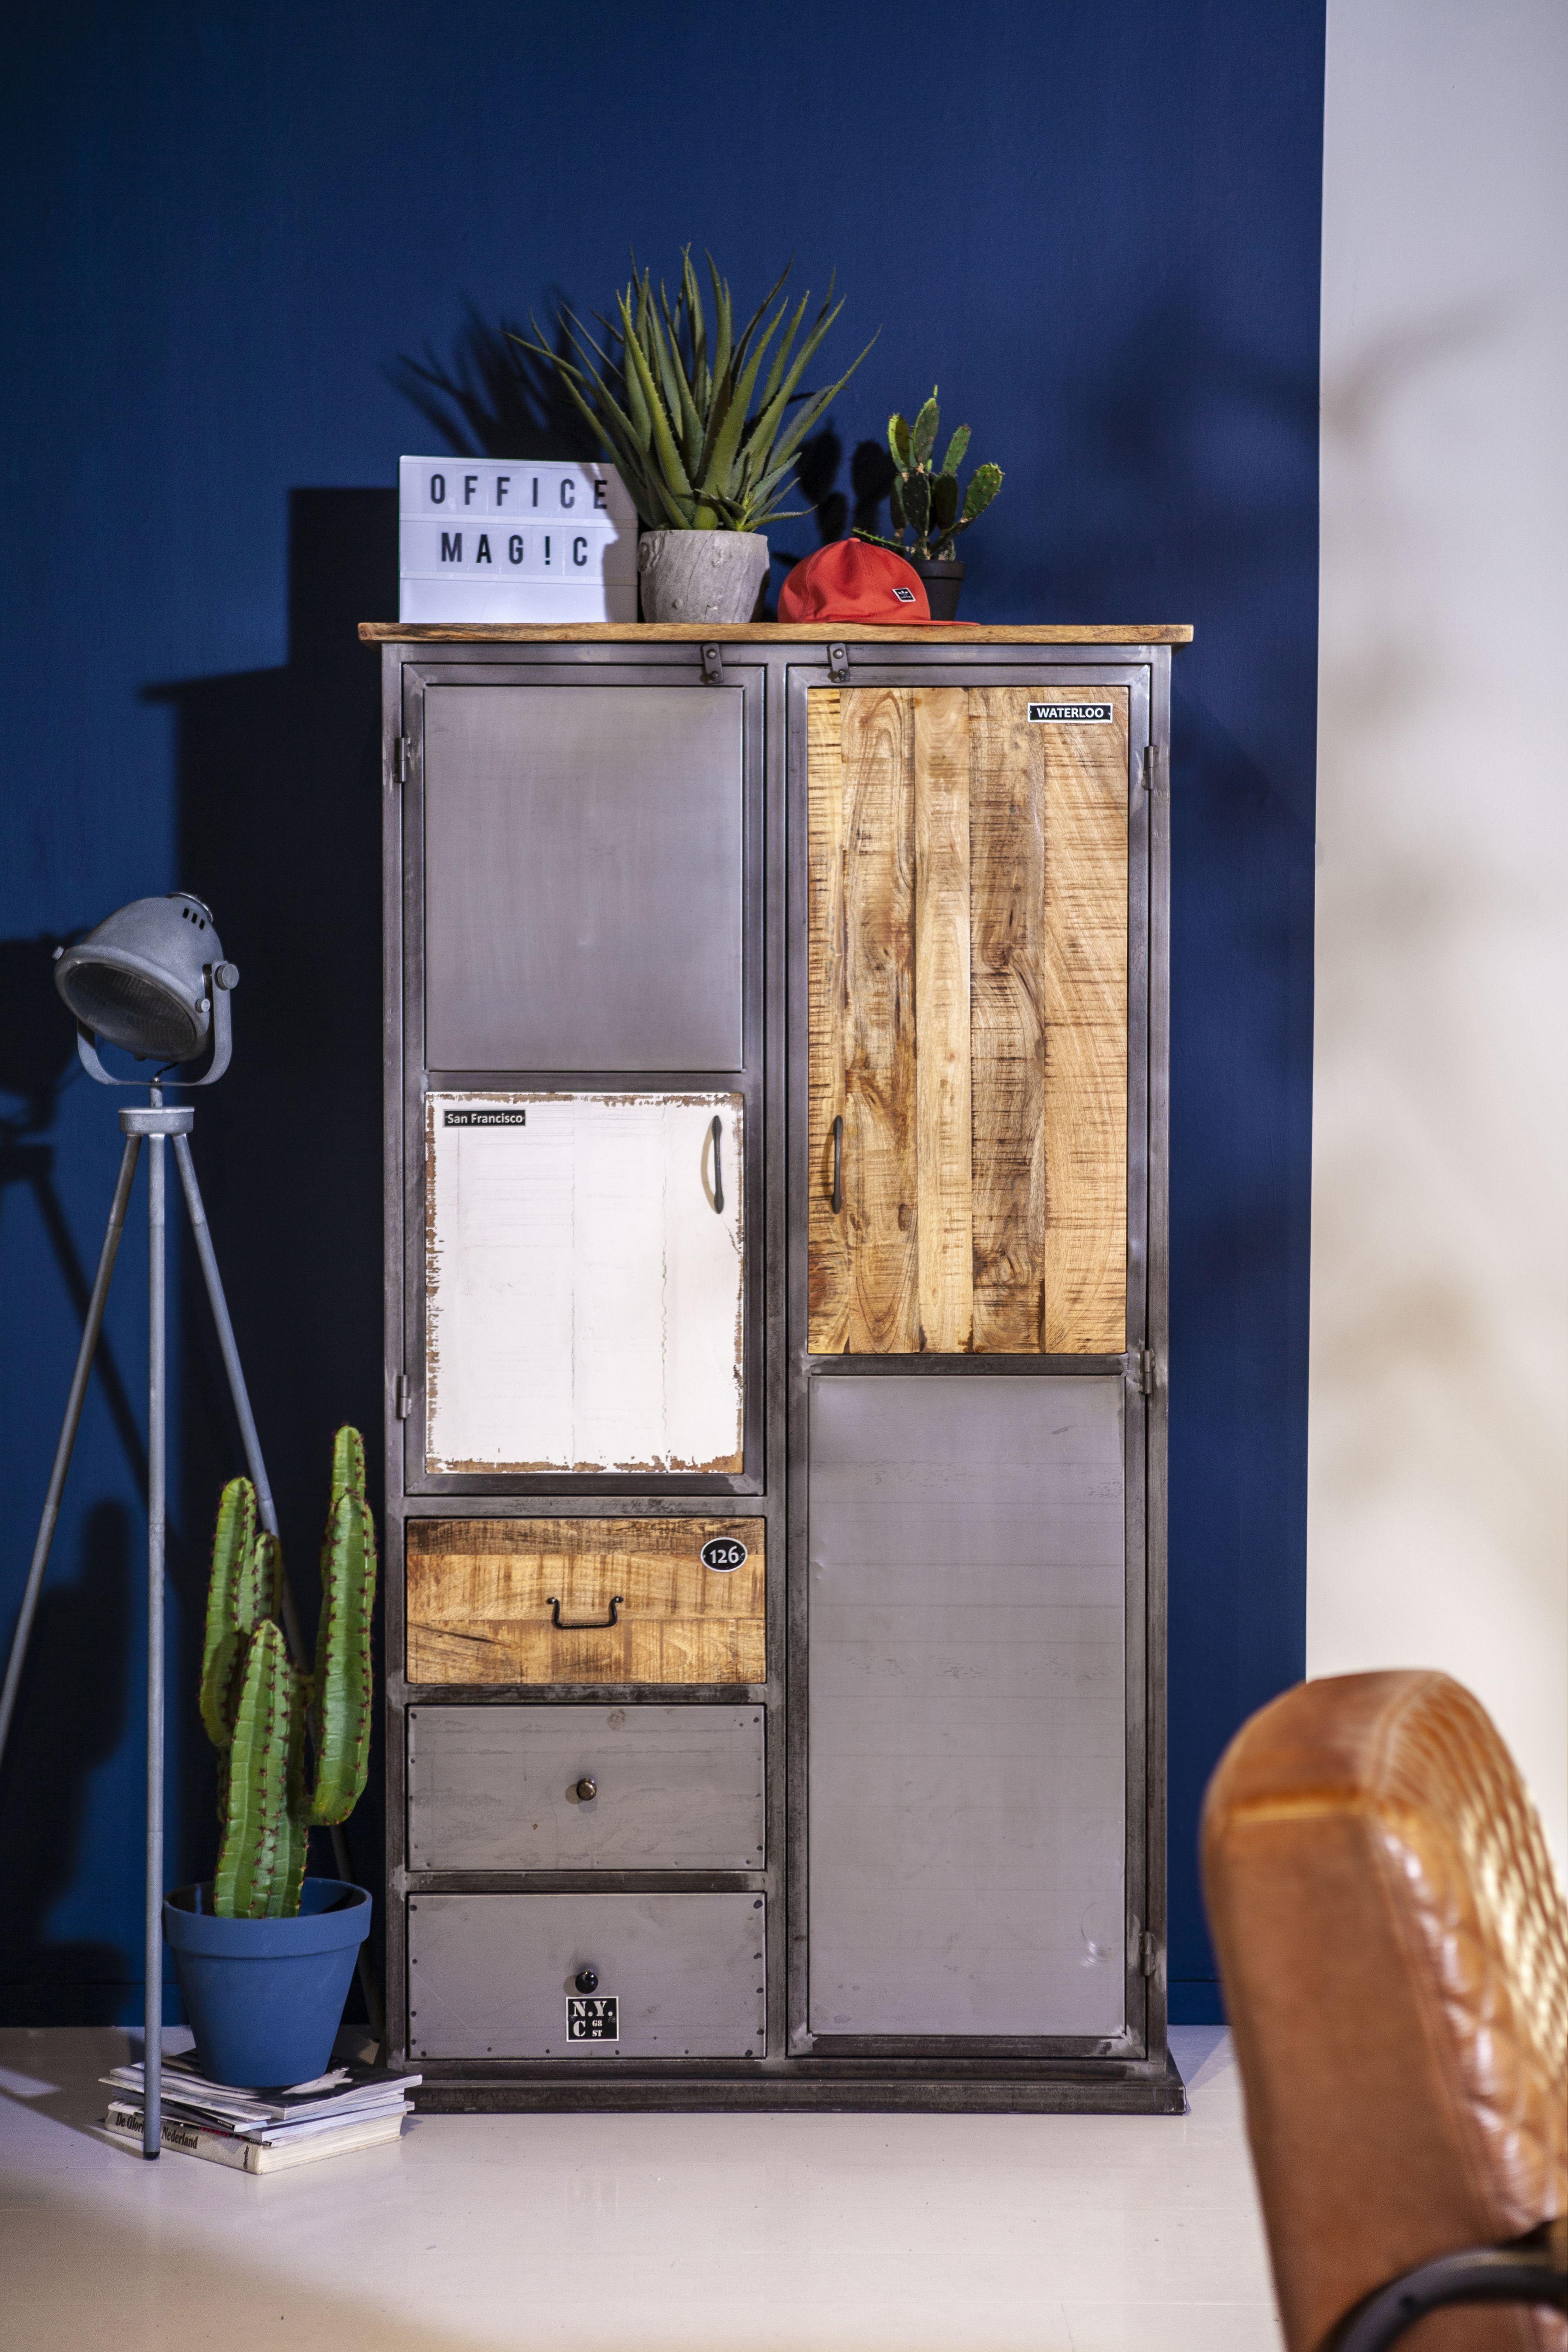 Spiksplinternieuw Eleonora Meubelen | Opbergkast, Vitrinekasten, Ikea keukenkasten XP-77